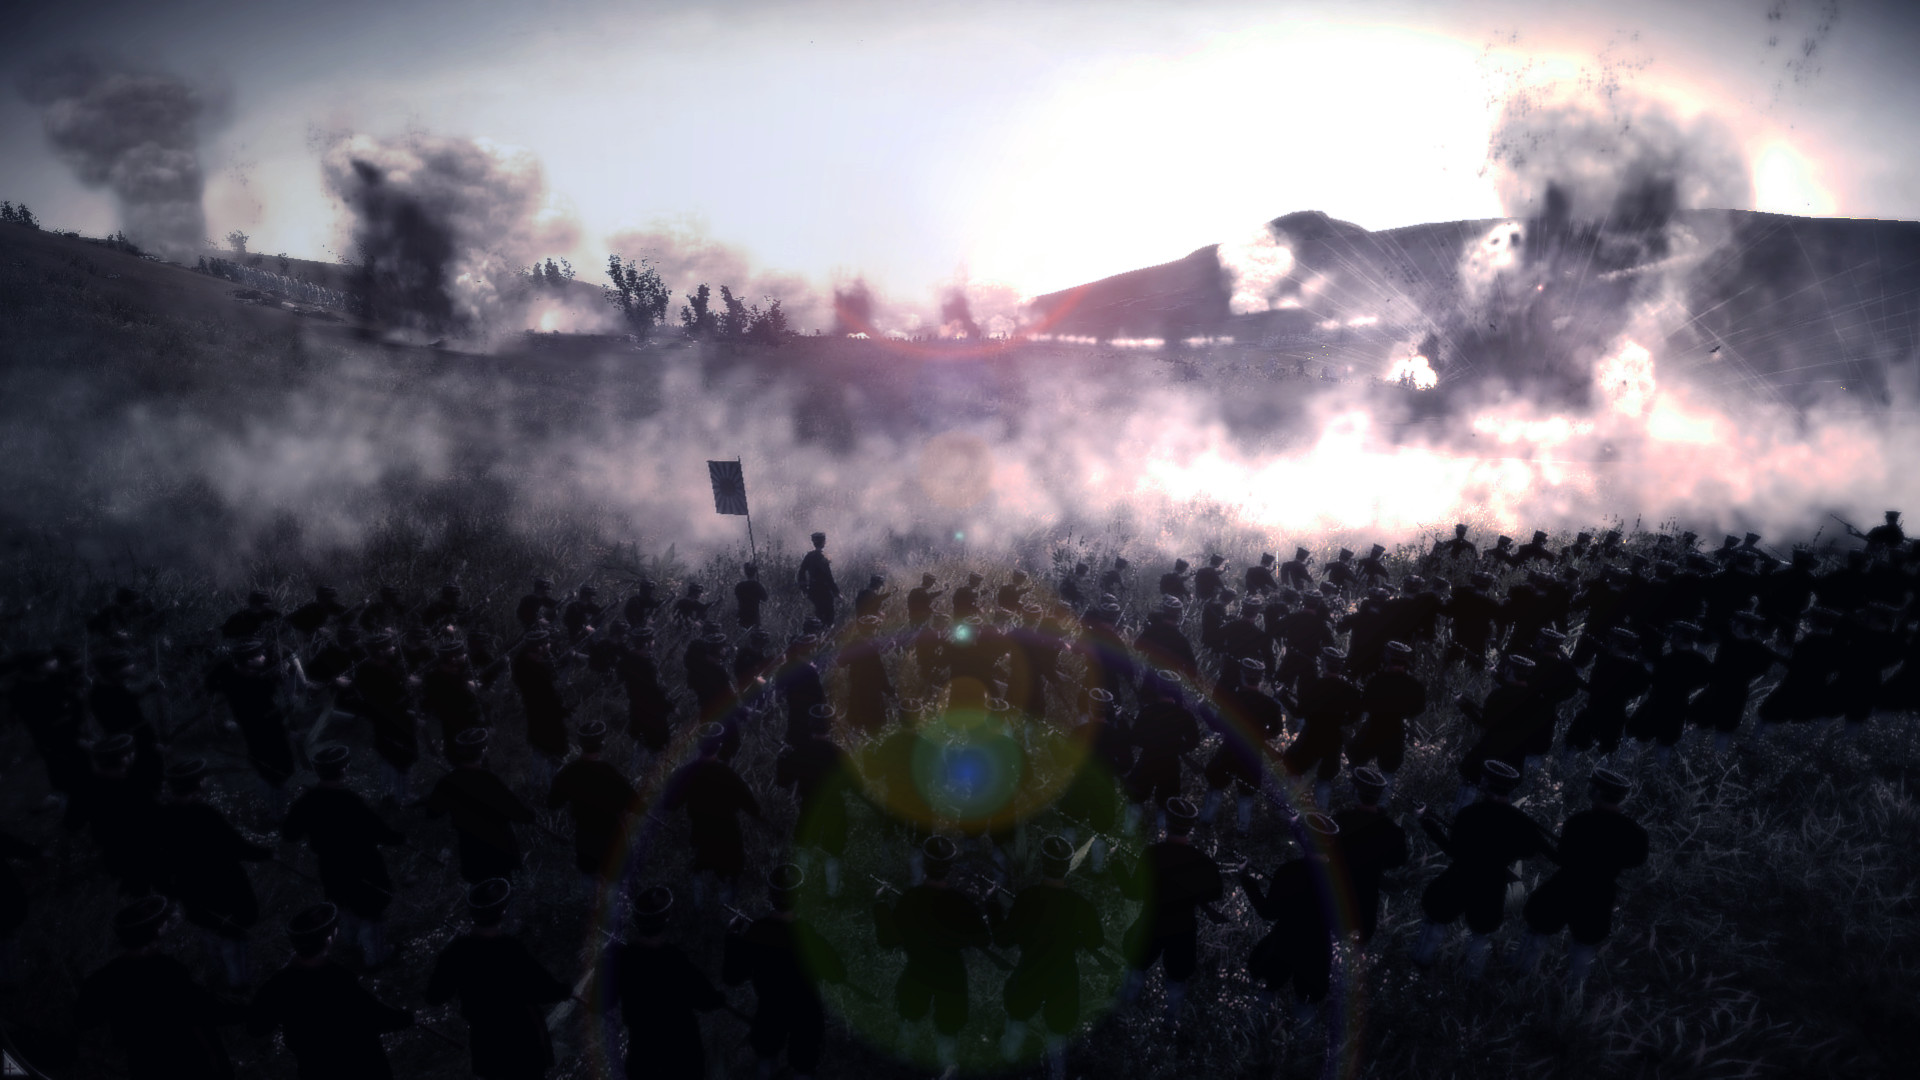 … Shogun 2 FOTS: Artillery attack by LaNoif